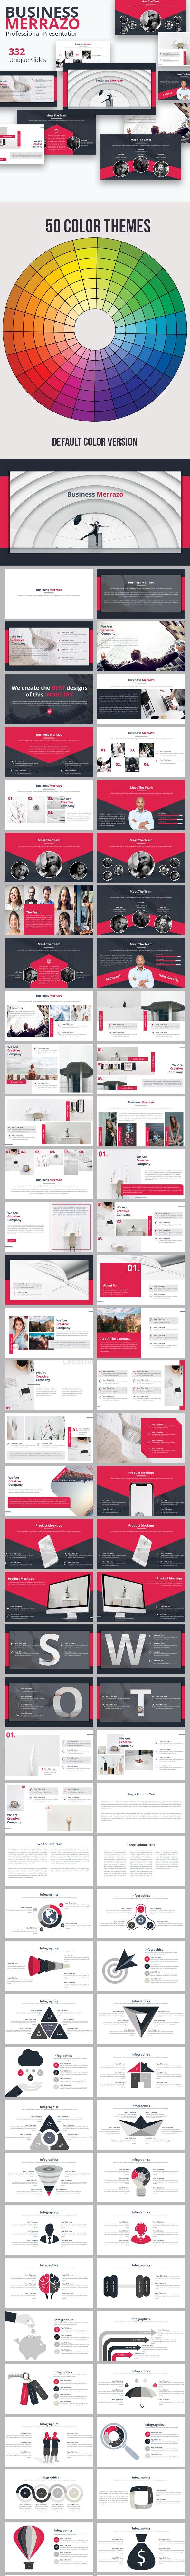 Business Merrazo Powerpoint Presentation Template - Business PowerPoint Templates